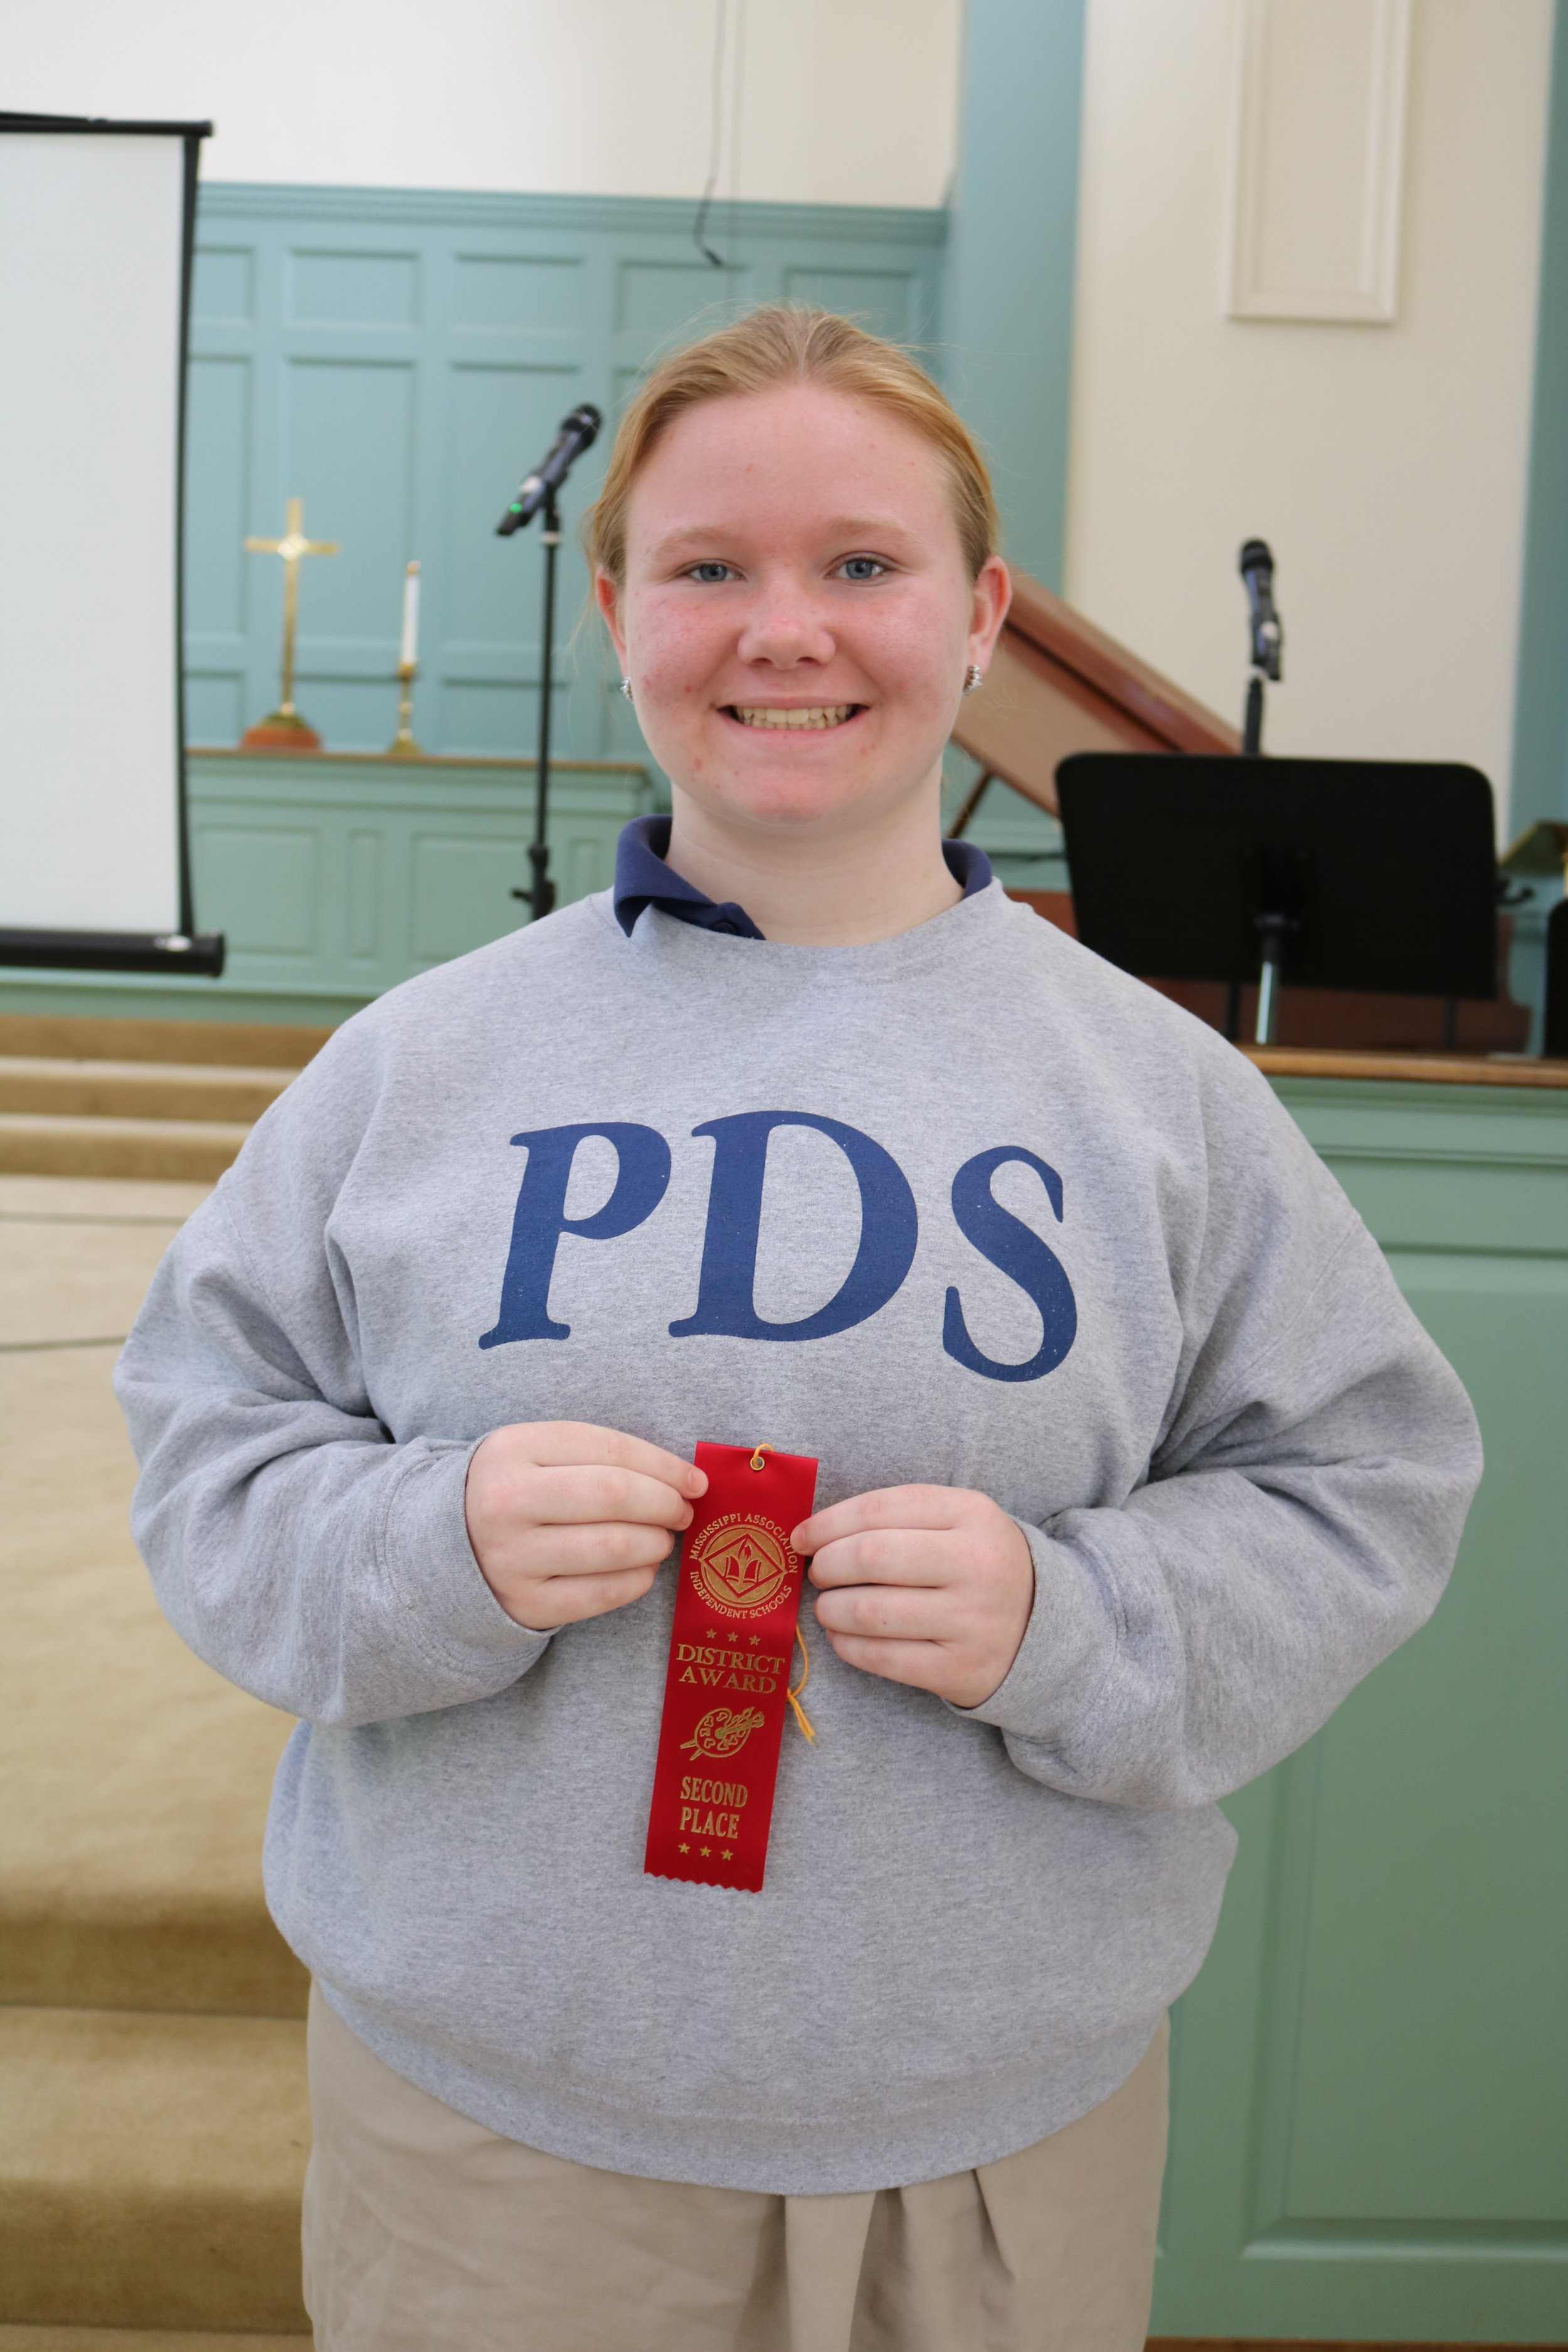 6th grade MAIS winner